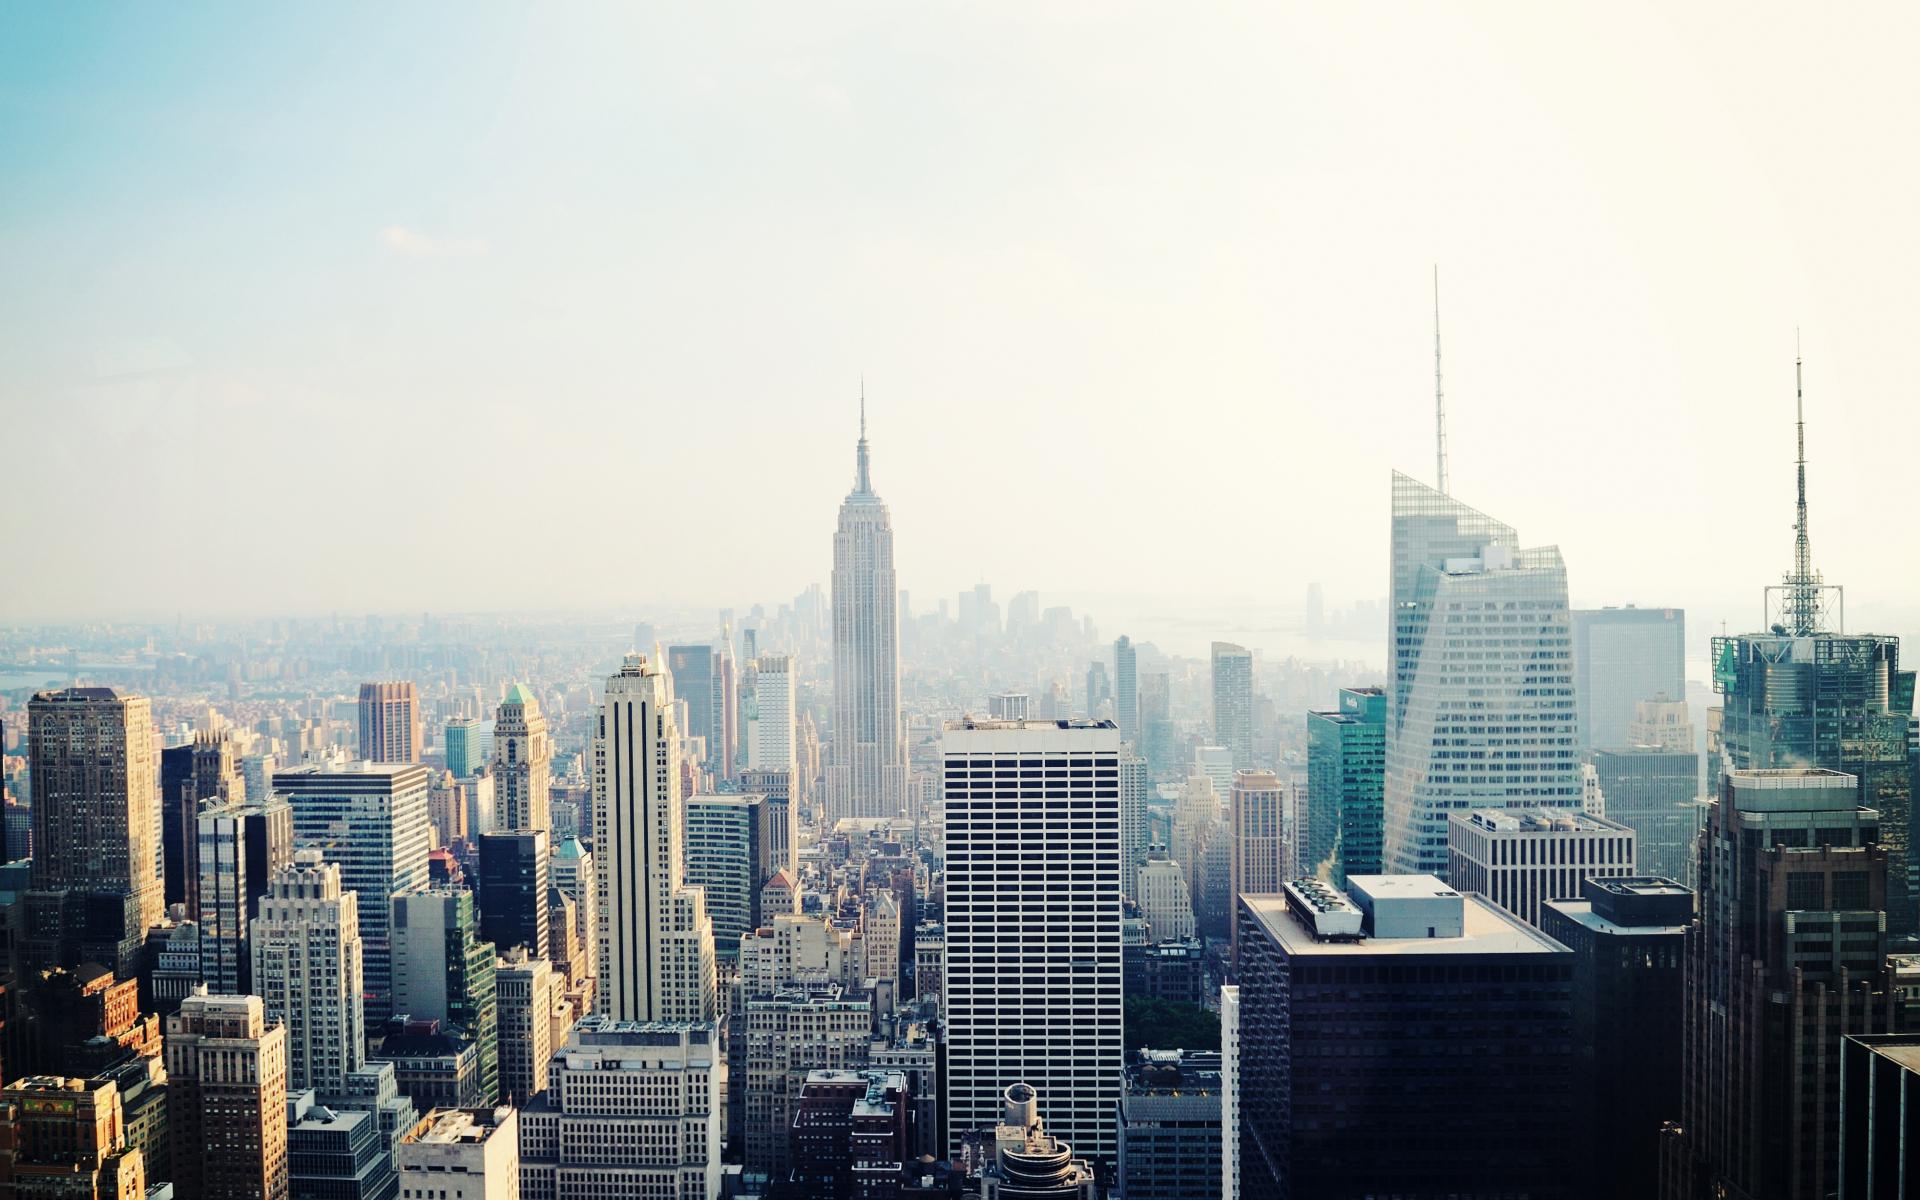 New York, cityscape, buildings, 1920x1200 wallpaper